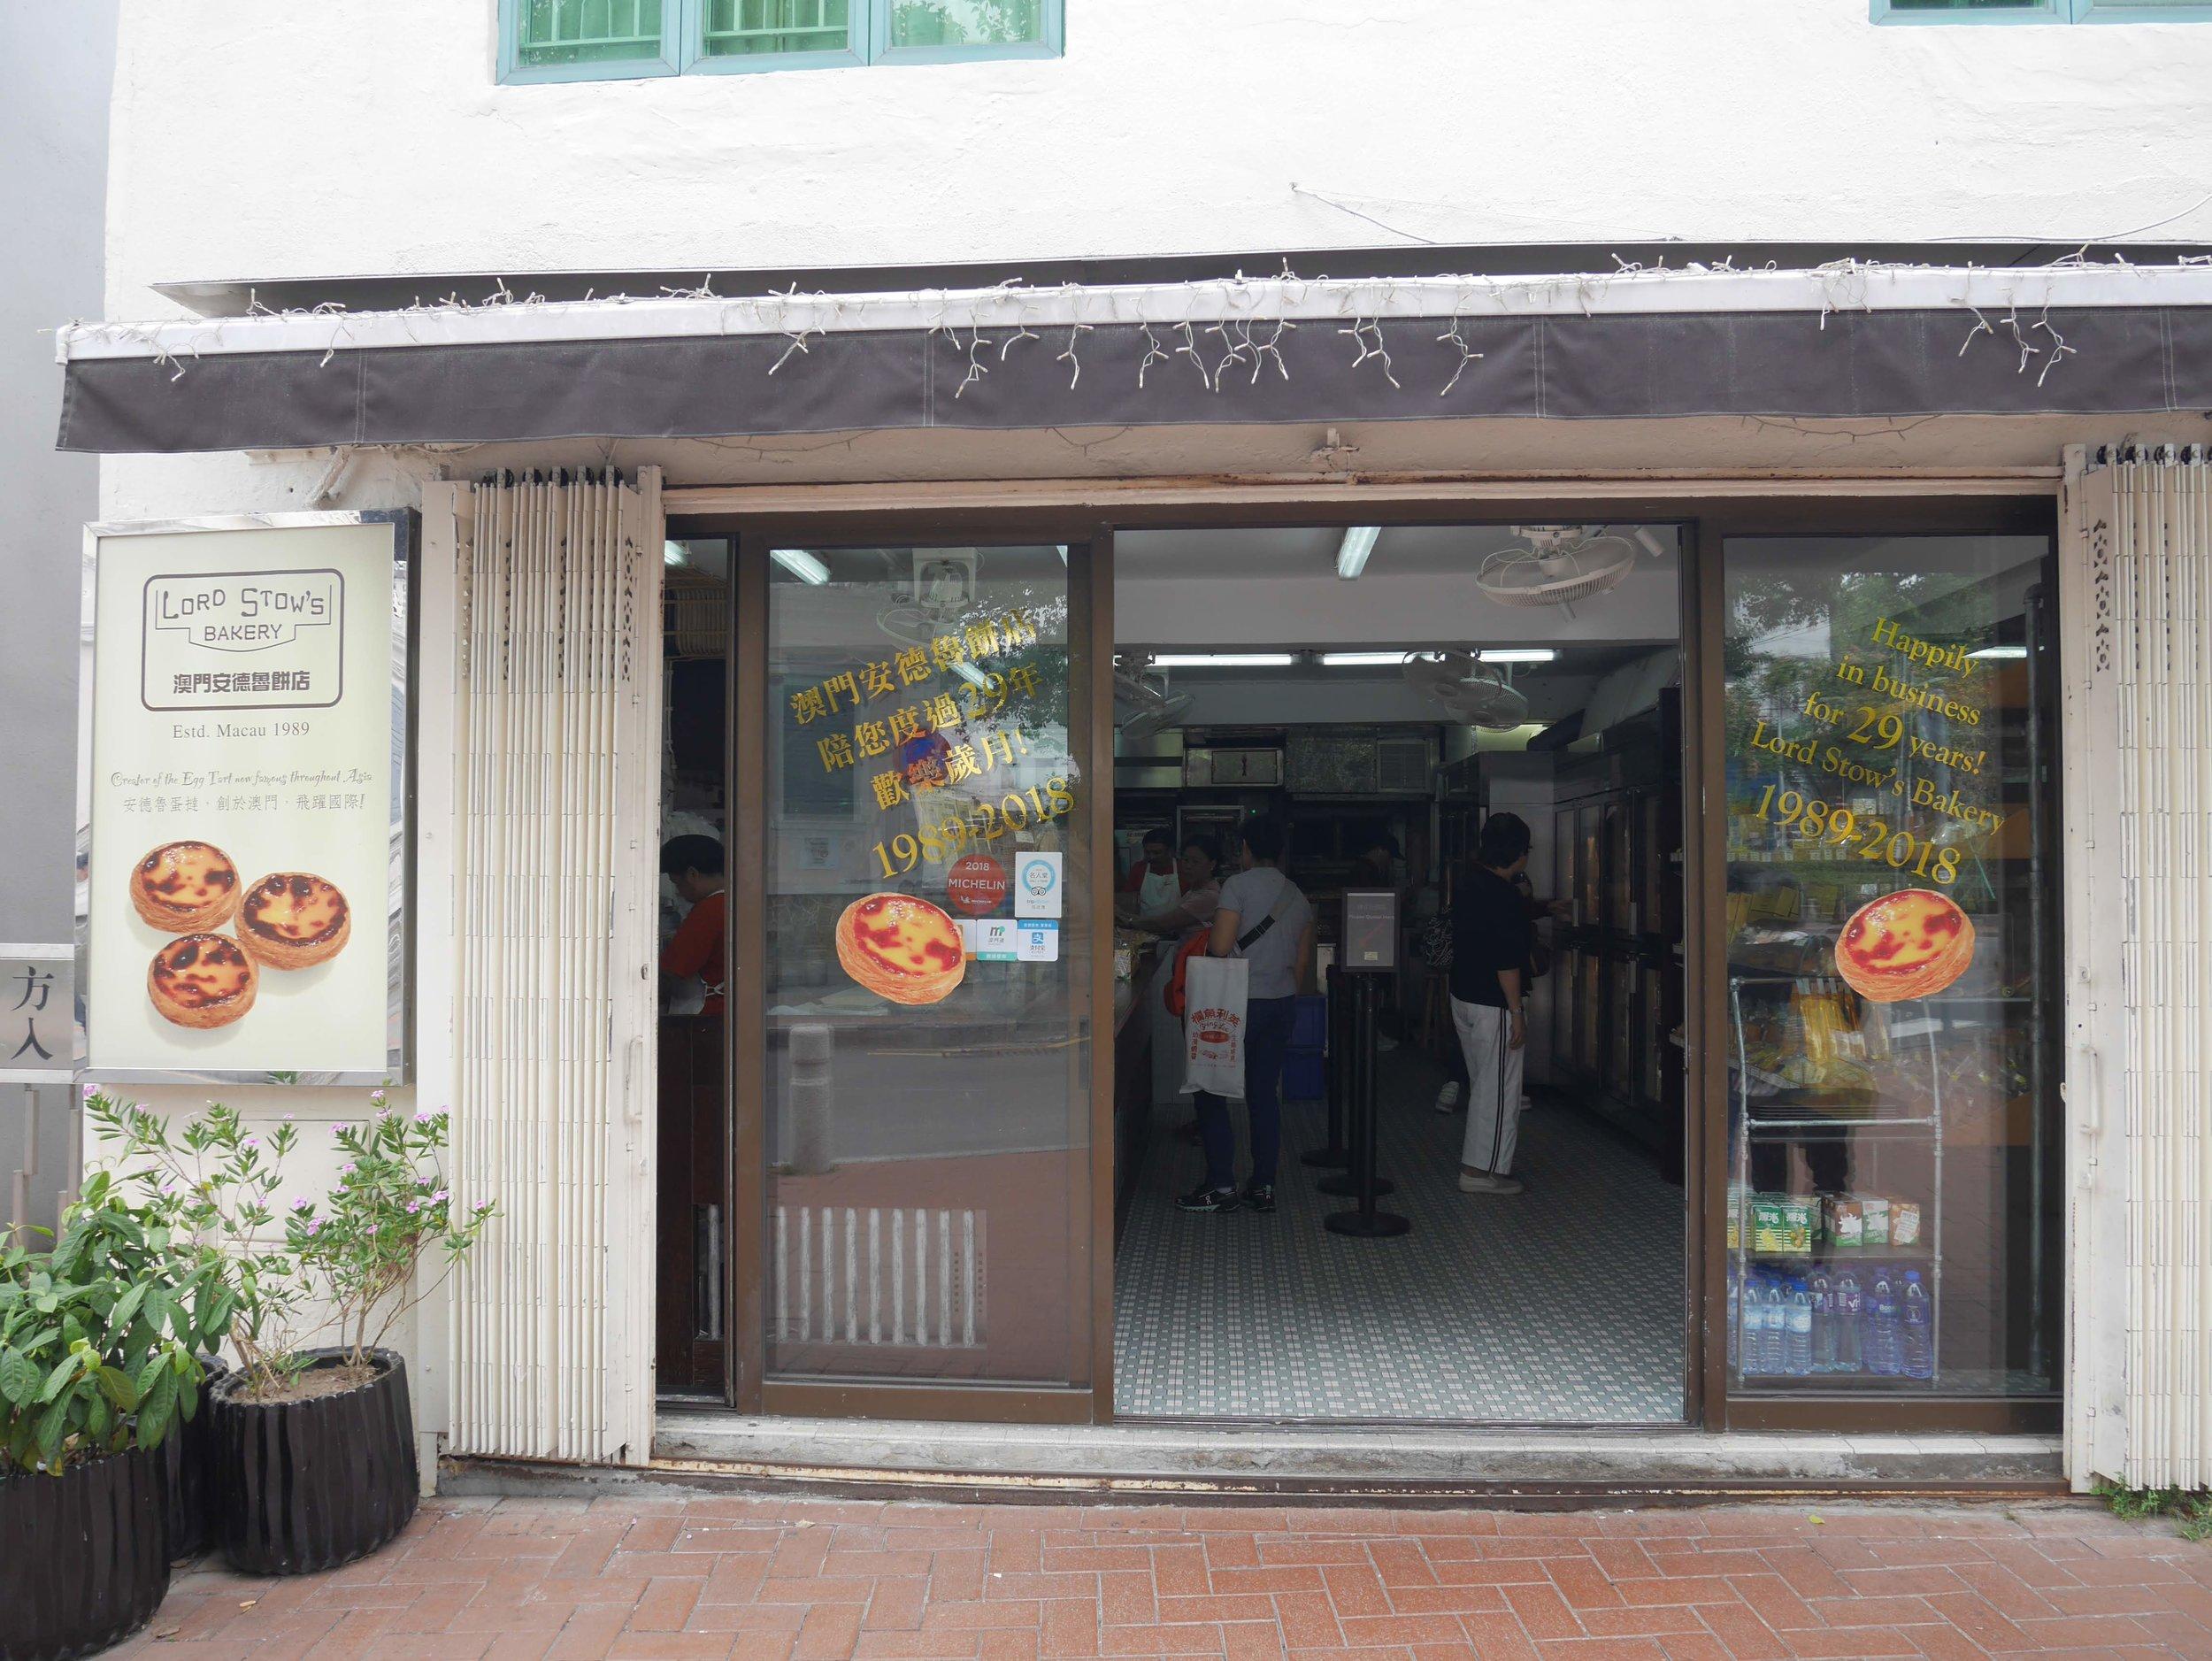 Lord Stow's Bakery, Macau